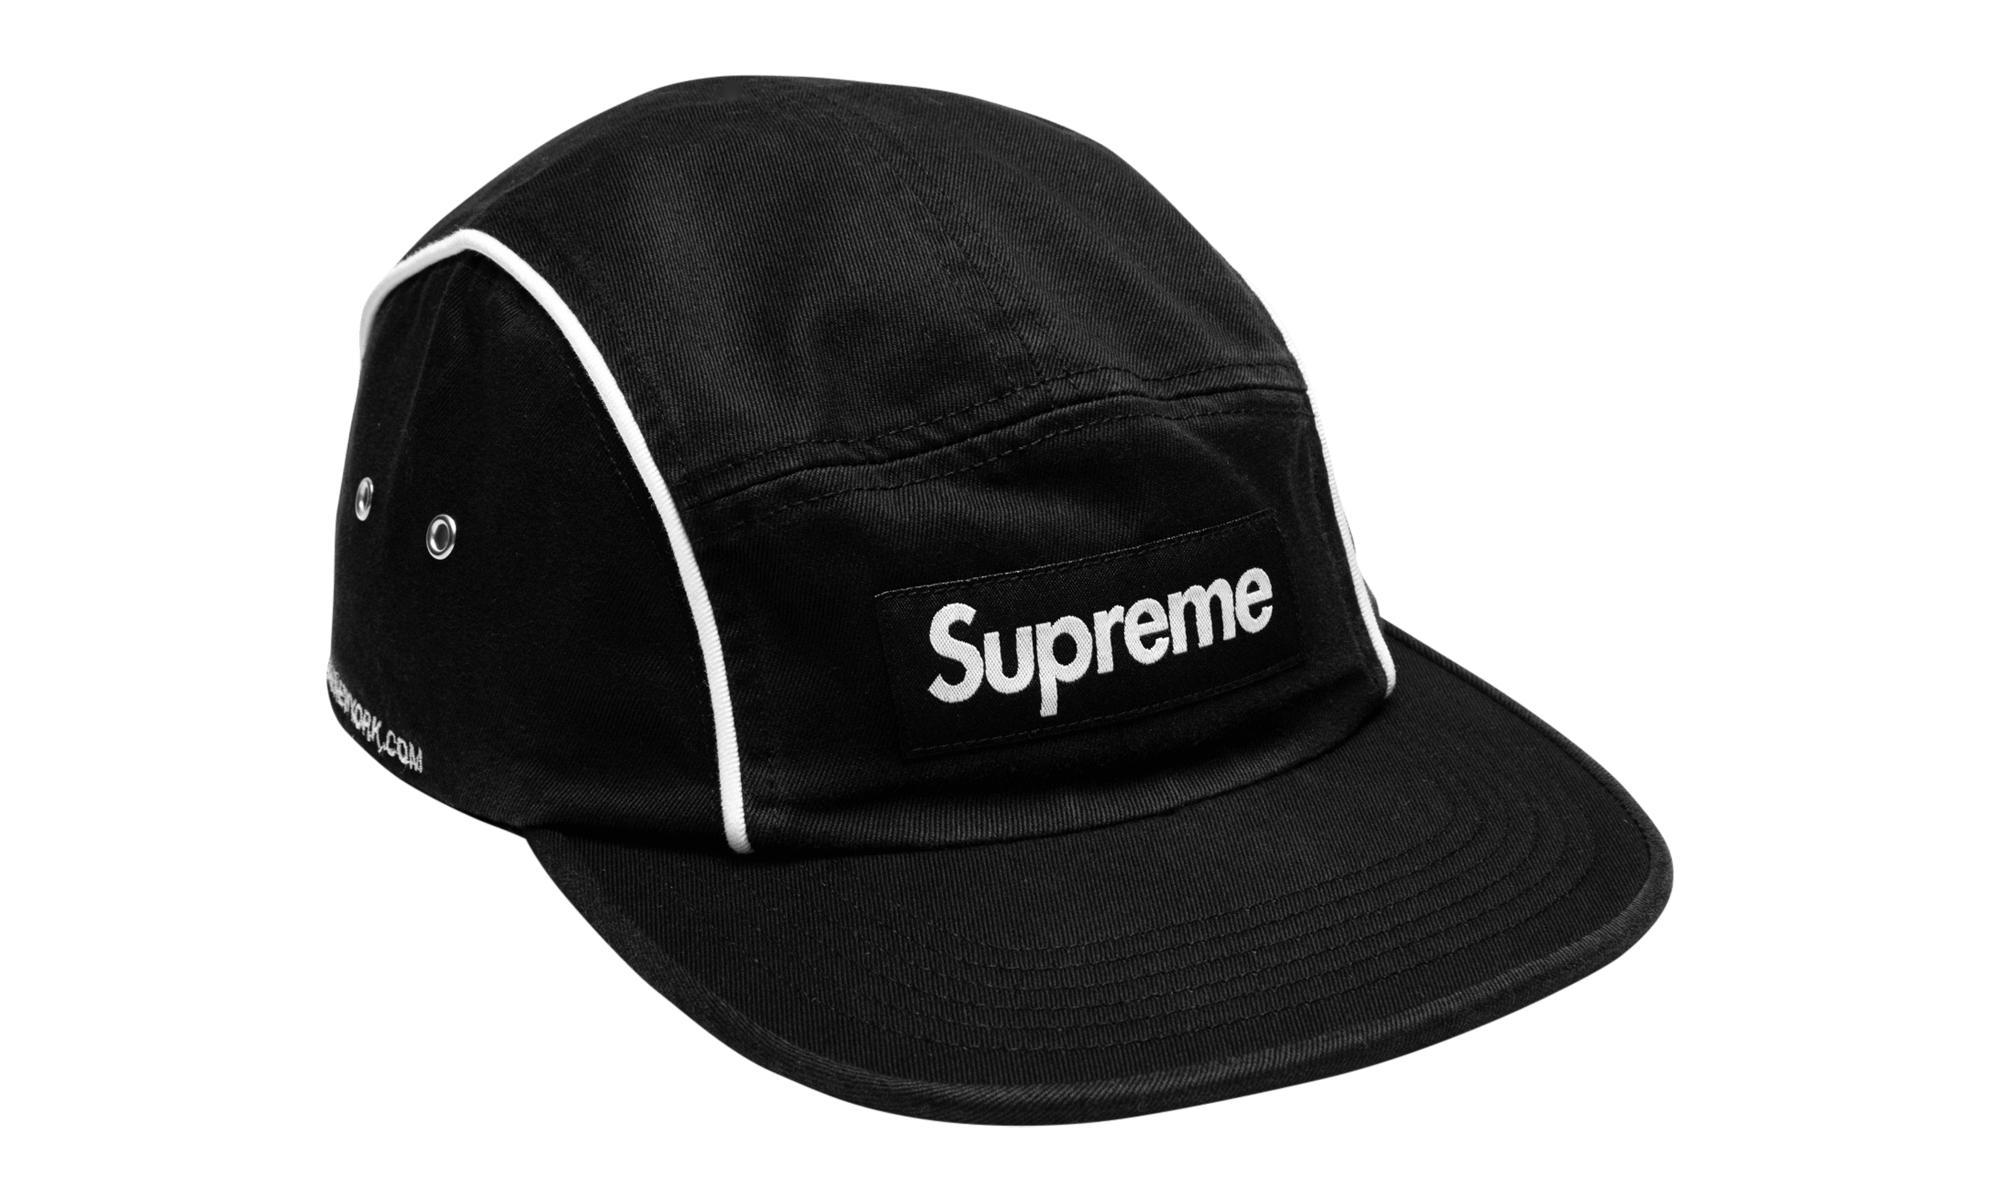 Lyst - Supreme Piping Camp Cap in Black for Men f0f10410a16